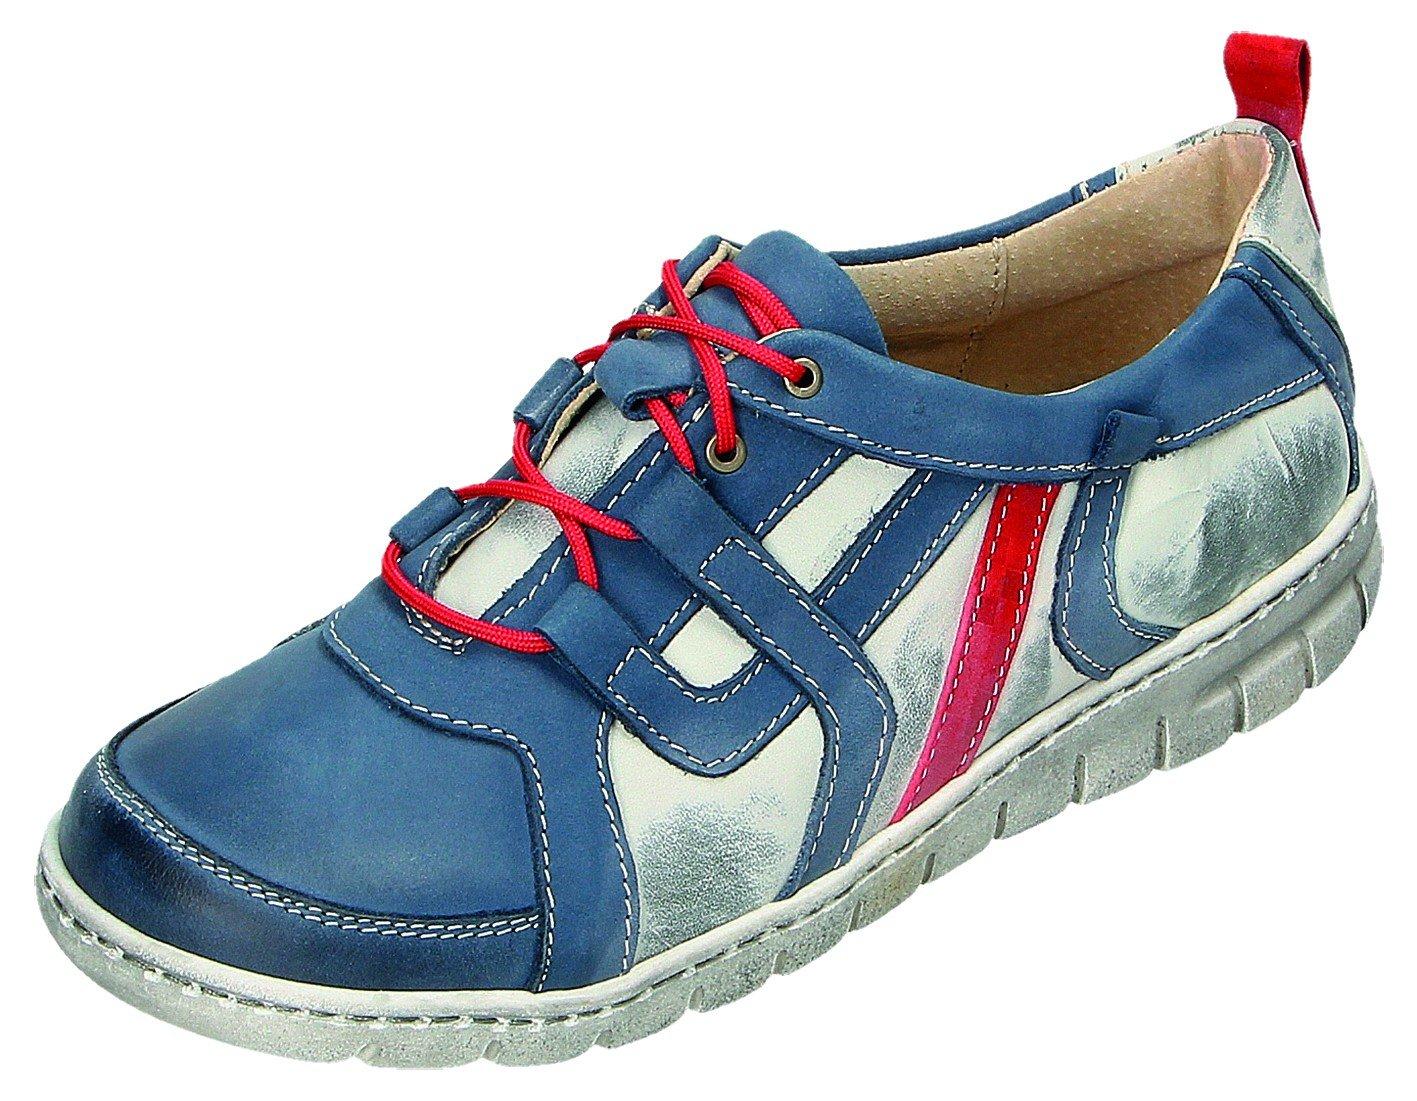 MICCOS Zapatos de Cordones Para Mujer Azul Blau/Komb. 38 EU|blau/komb.